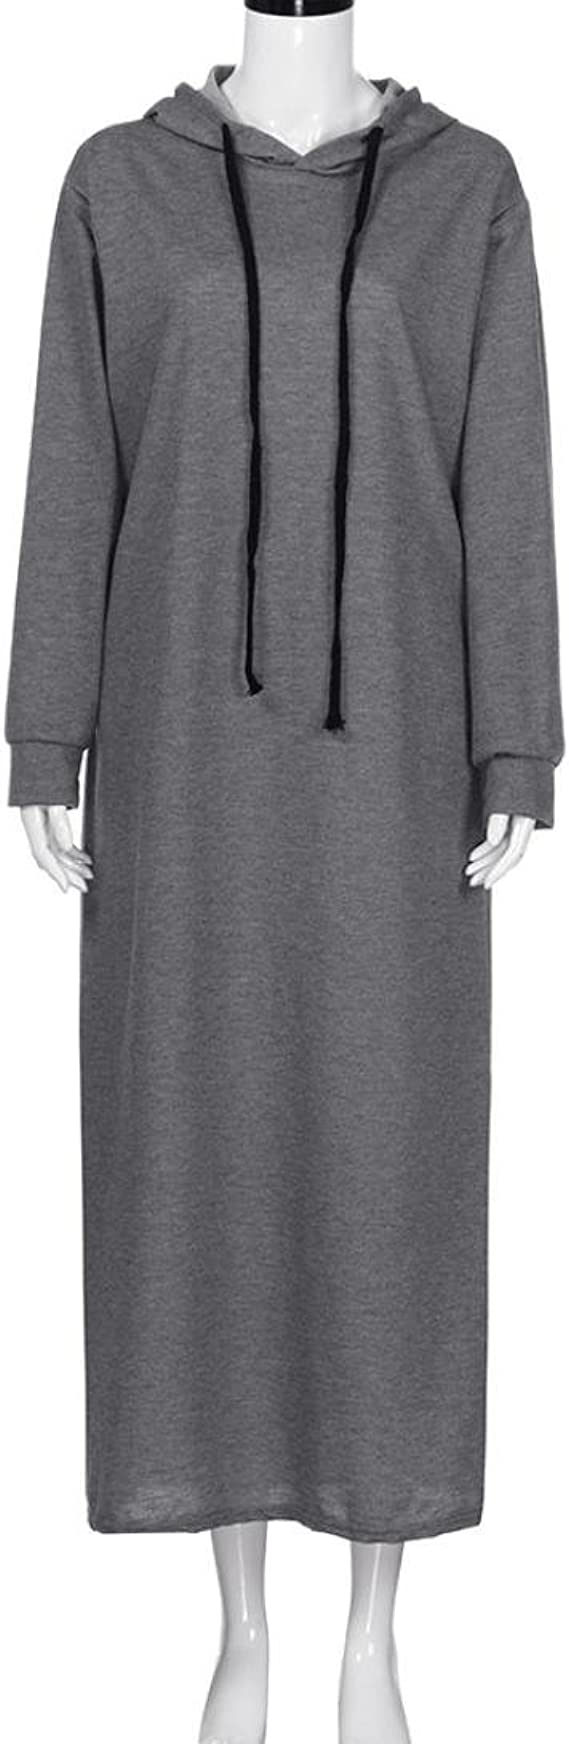 Kleider,Frashing Damen Pullover Lang Hoodie Sweatshirt Kleid Herbst Bodycon Top Maxi Kleid Lange Hülsen mit Kapuze Damen beiläufige Hoodies Lange